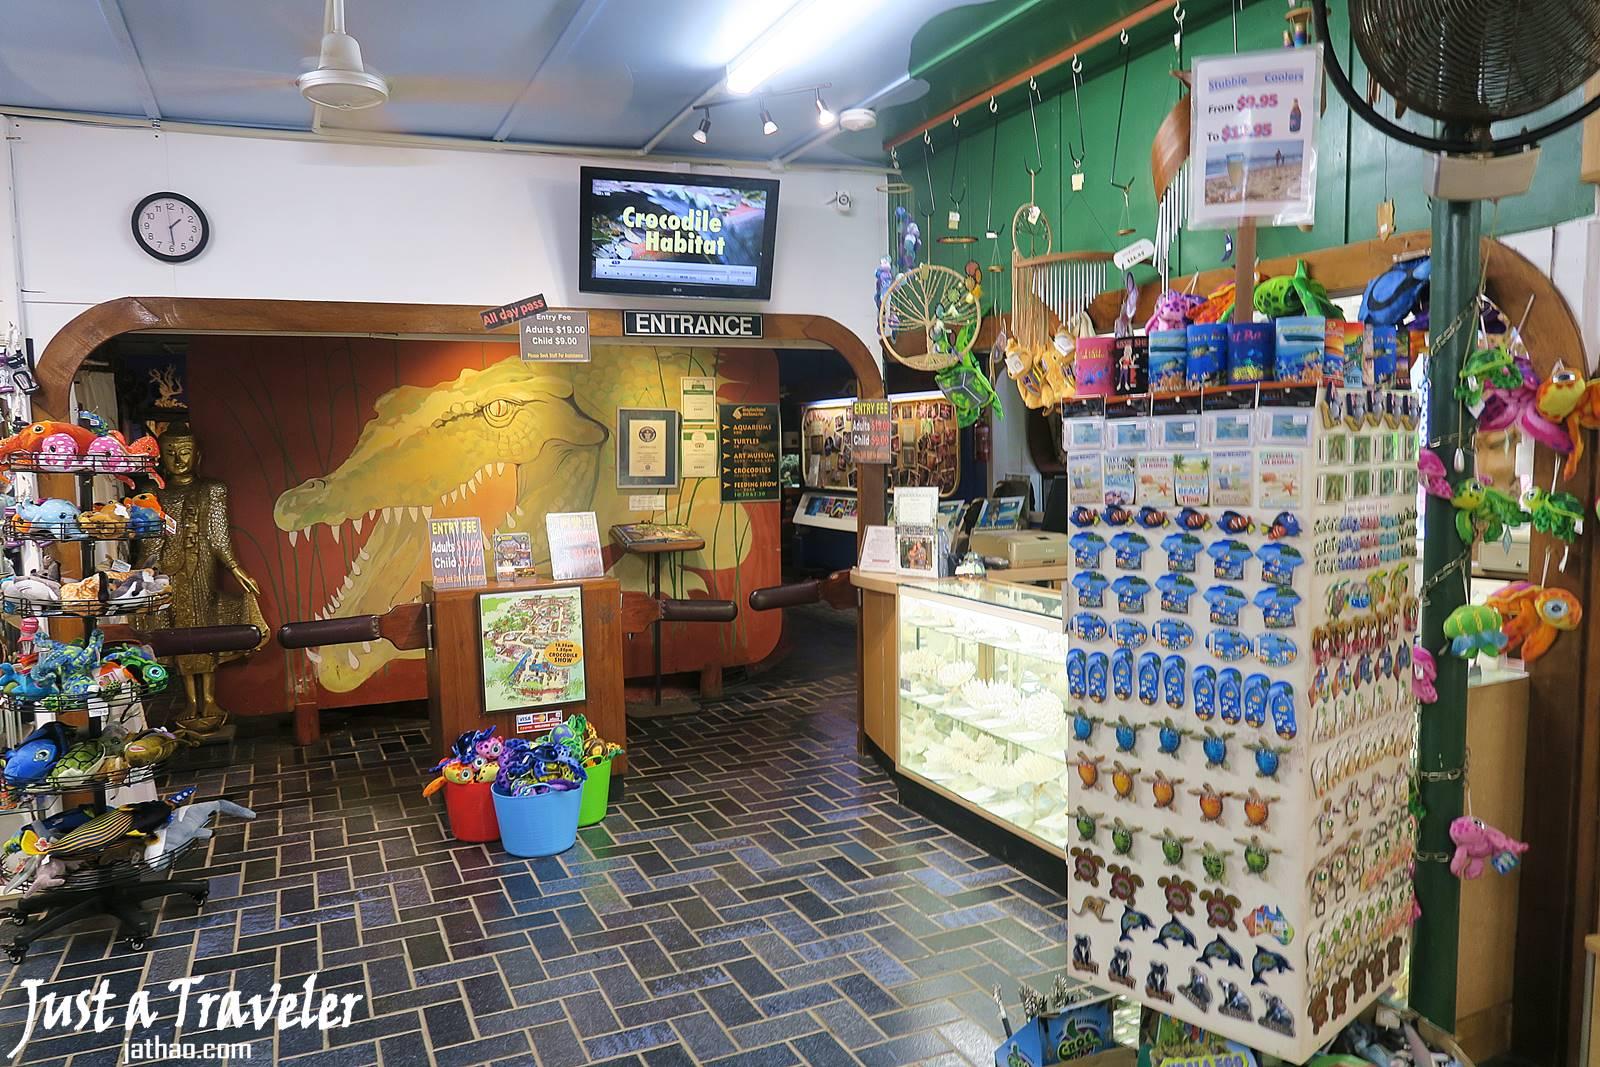 凱恩斯-大堡礁-綠島-內堡礁-鱷魚館-推薦-旅遊-自由行-澳洲-Carins-Great-Barrier-Reef-Green-Island-Marineland-Melanesia-Travel-Australia